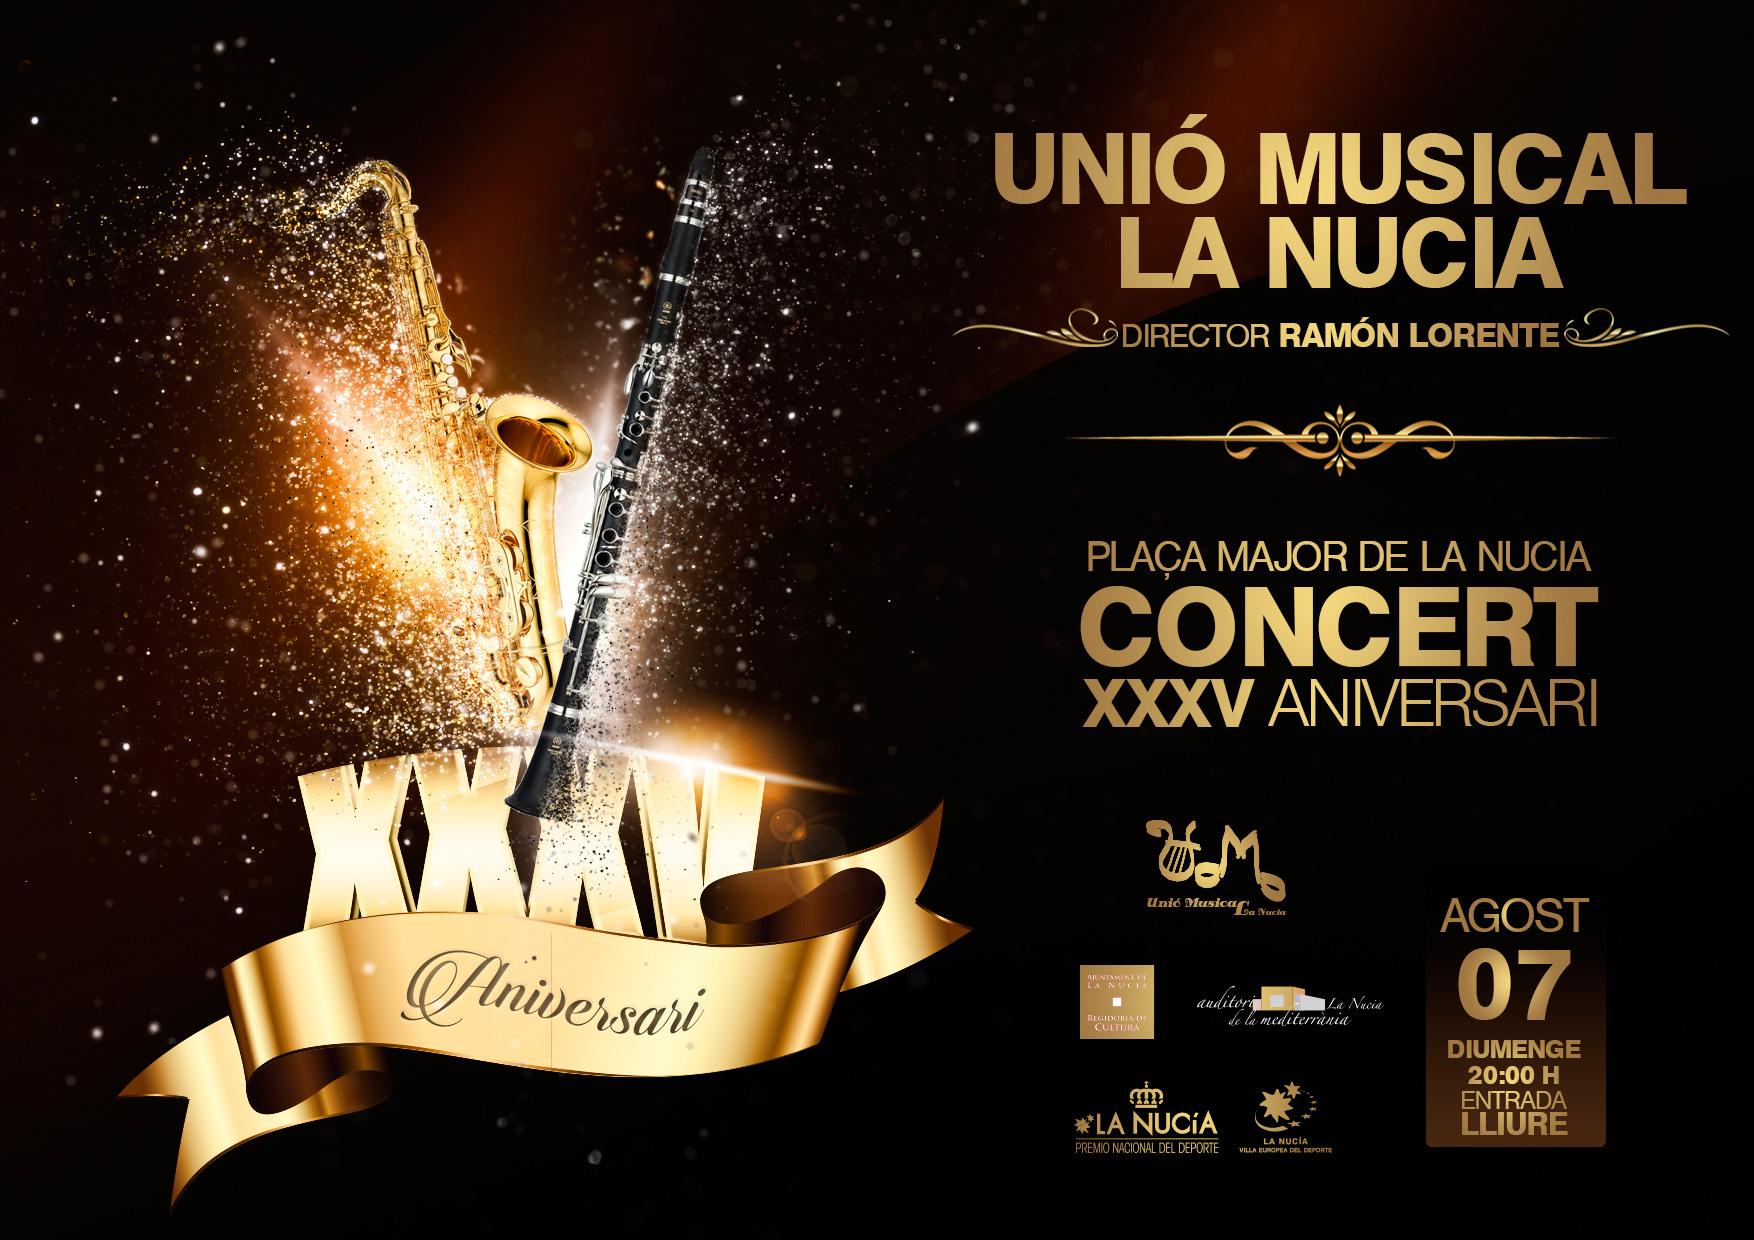 concert XXXV aniversari